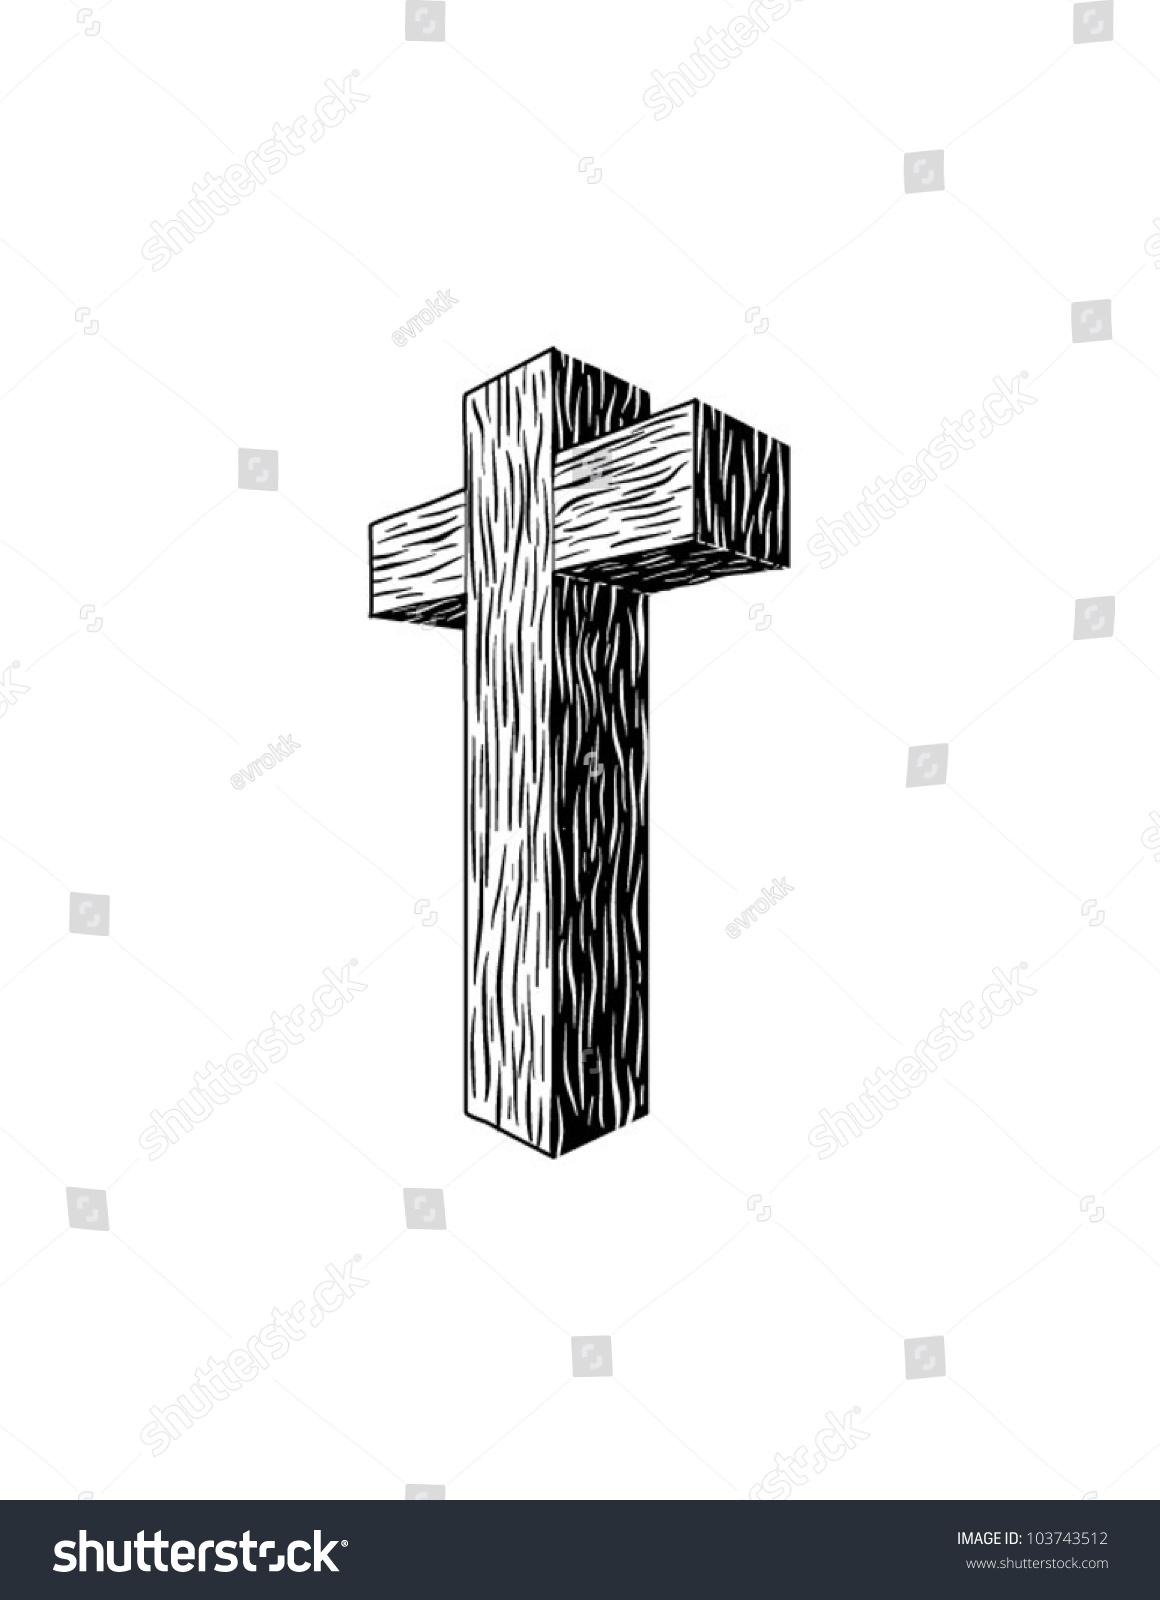 Wooden Cross Vector - 103743512 : Shutterstock